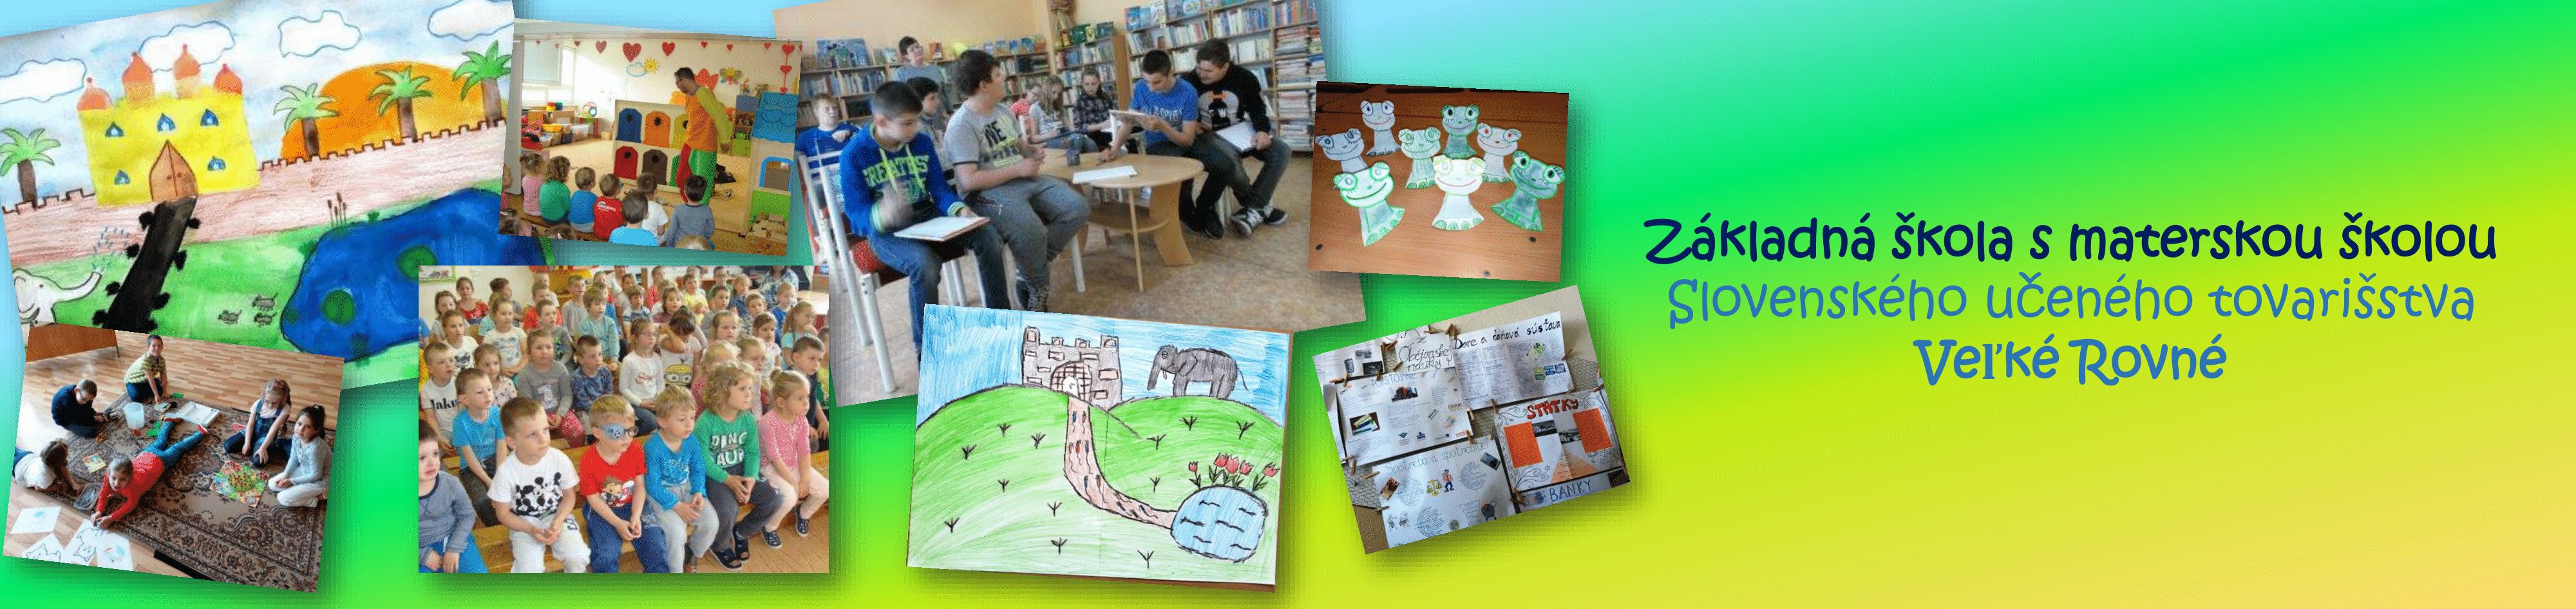 Základná škola s materskou školou Slovenského učeného tovarišstva Veľké Rovné